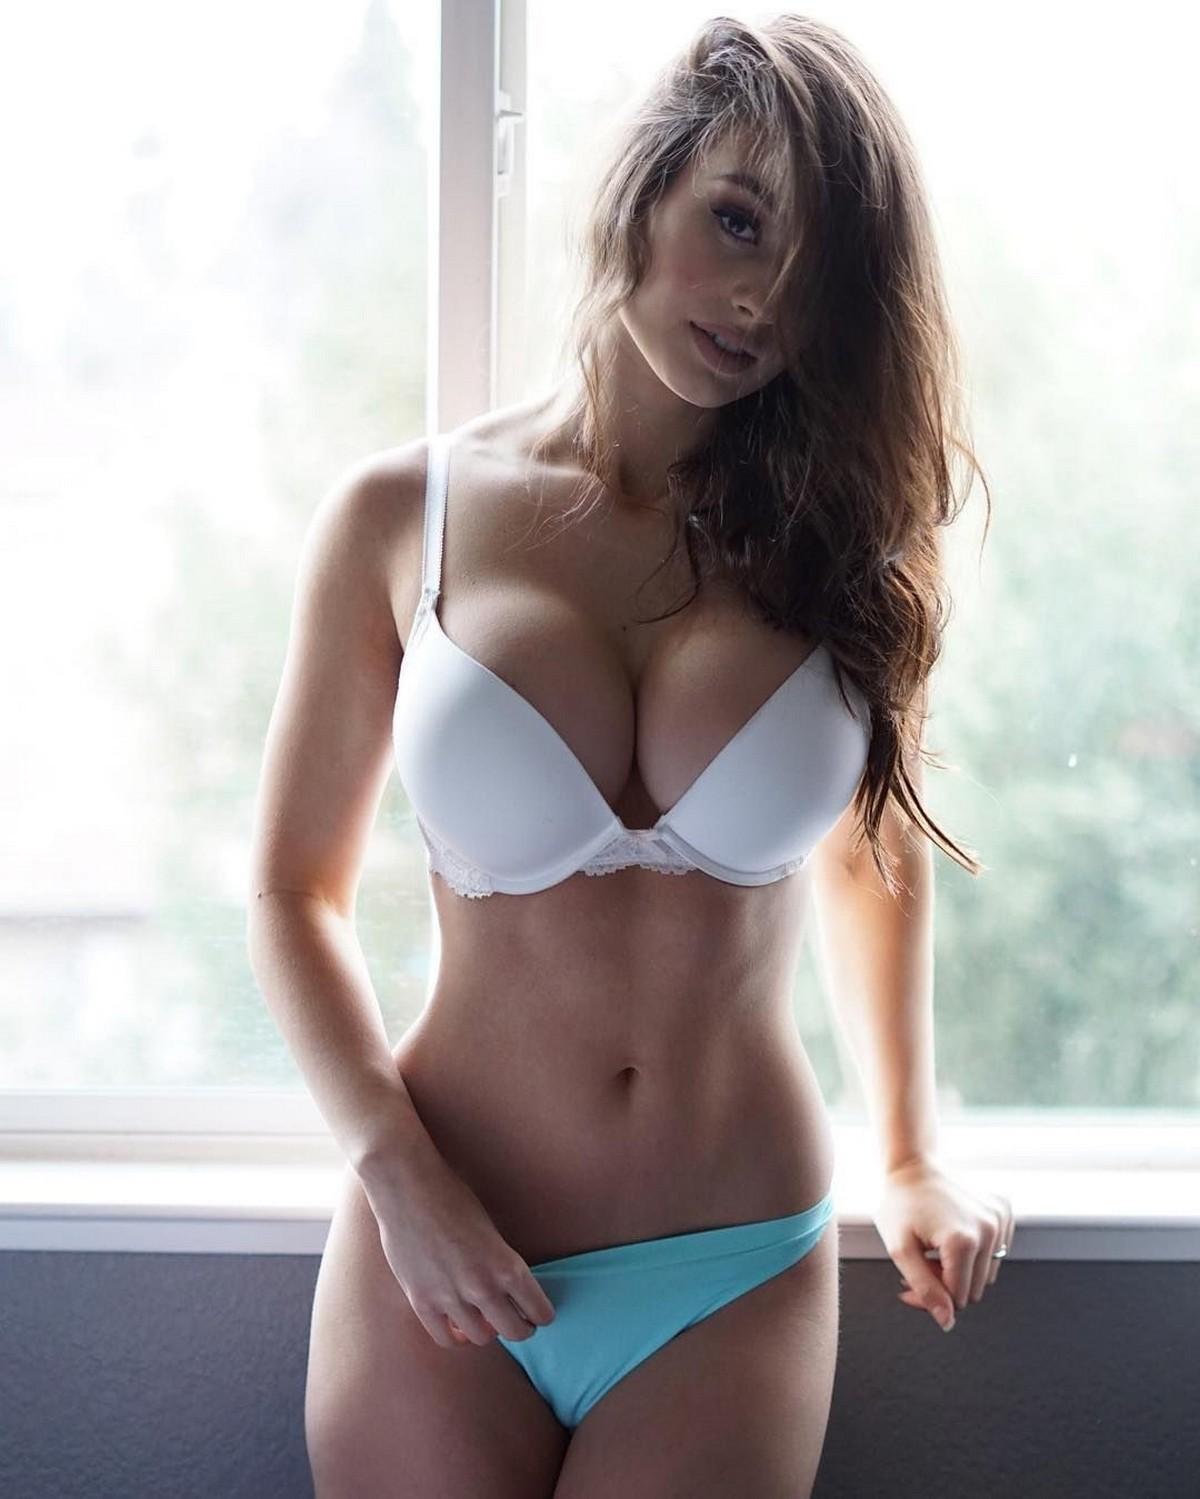 fotos de morenas eroticas